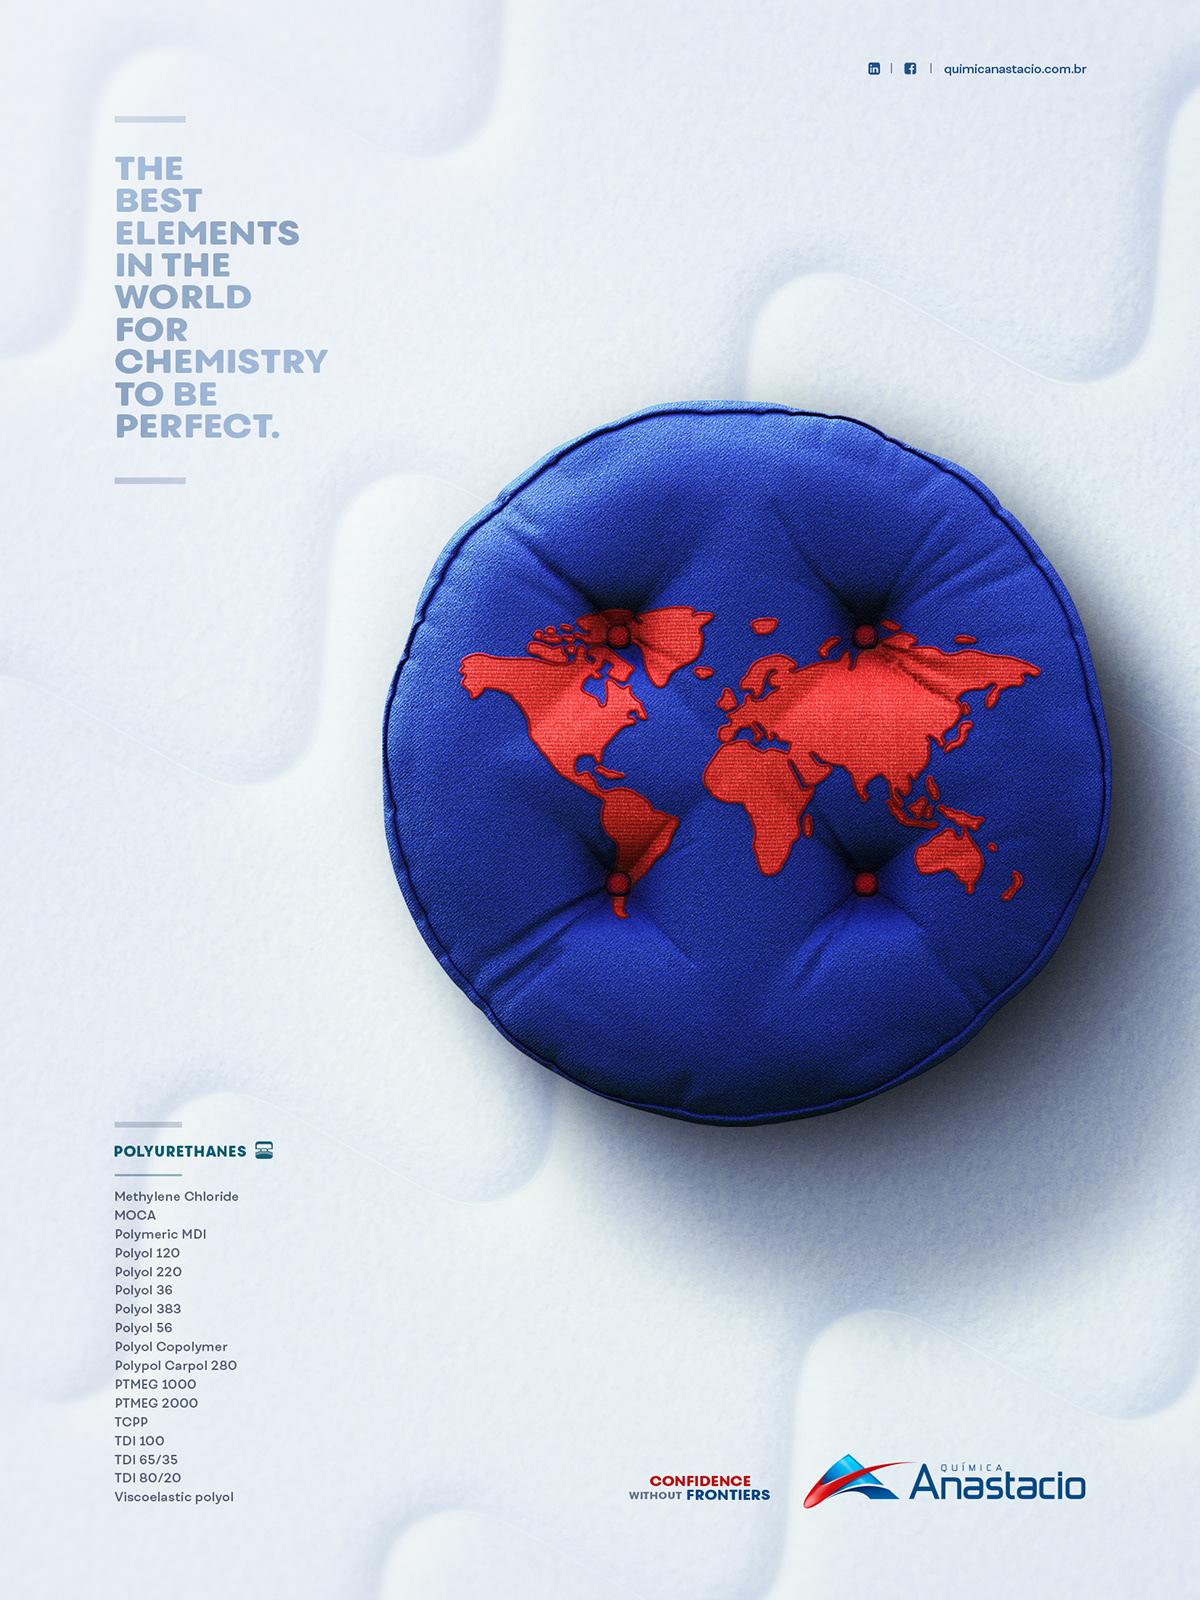 Advertising  Propaganda print ad 3D Food  chemistry industry Brazil world